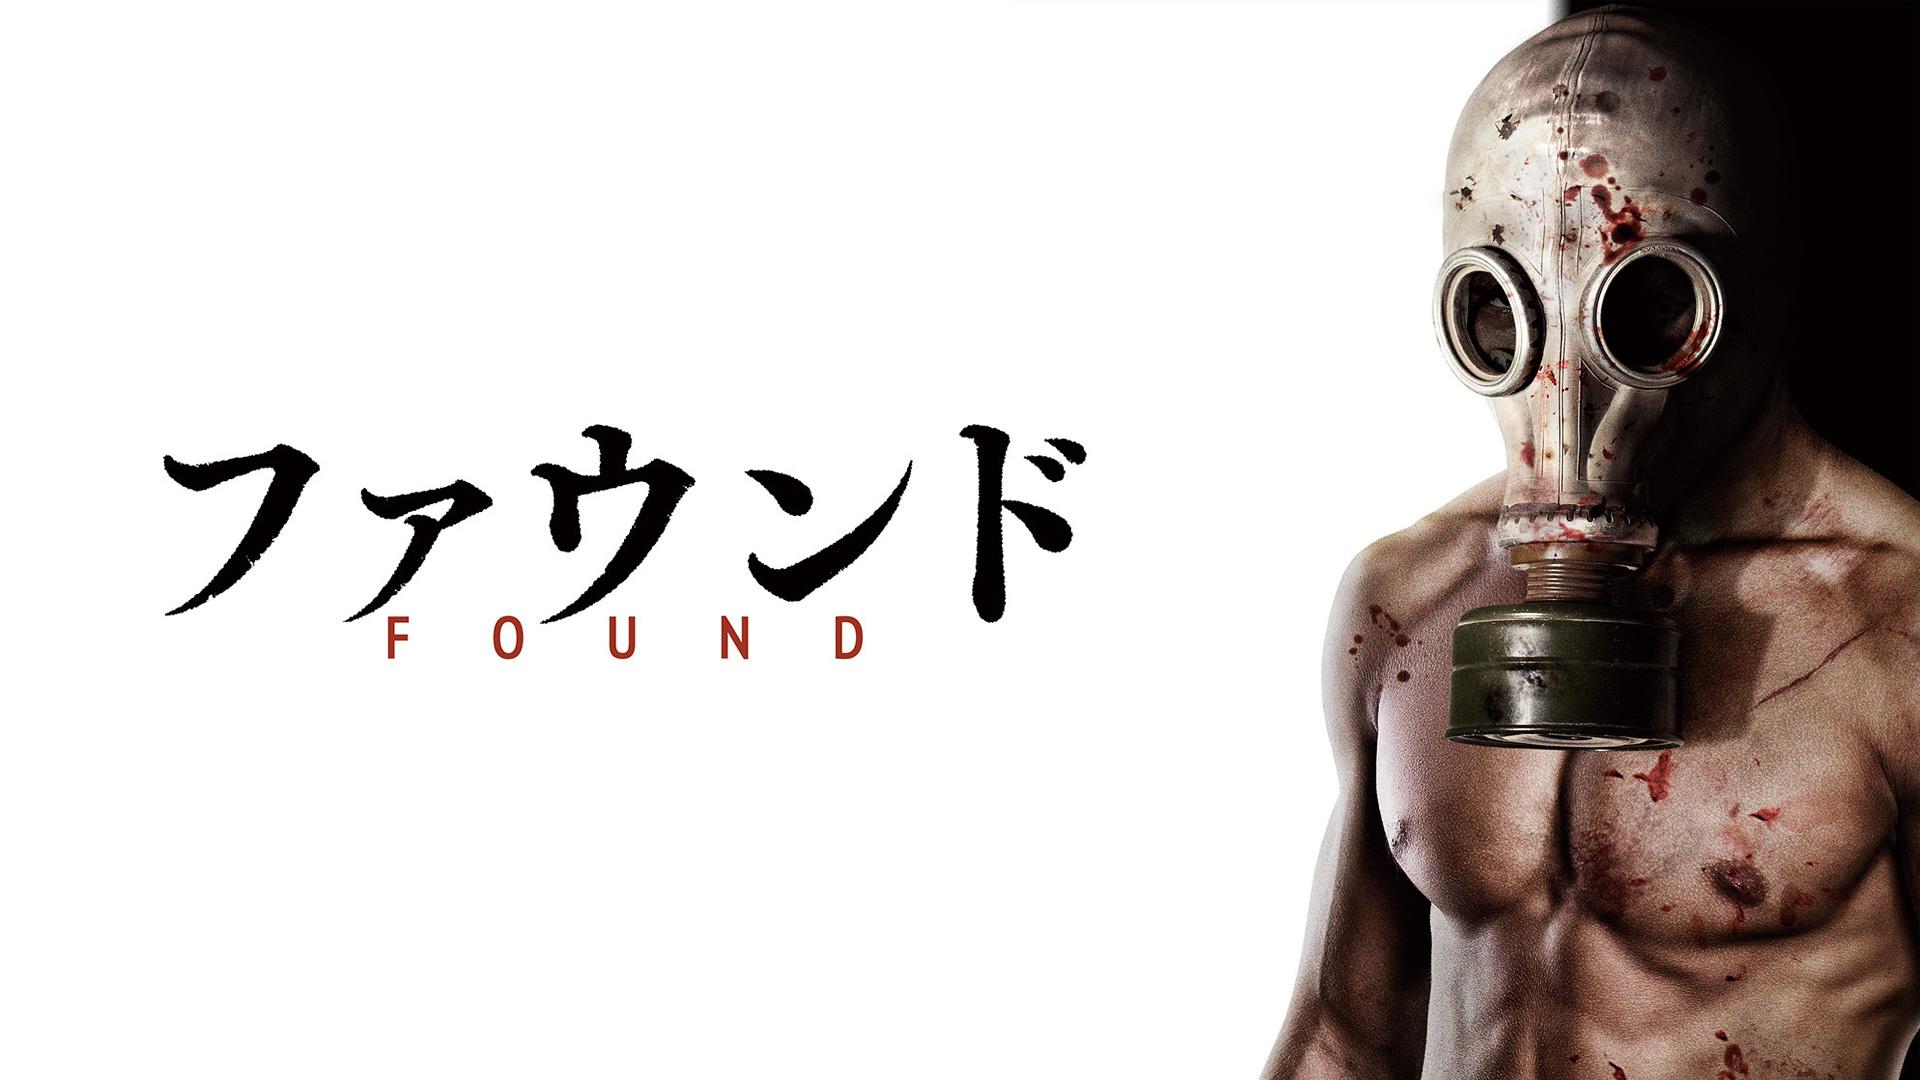 FOUND ファウンド(字幕版)